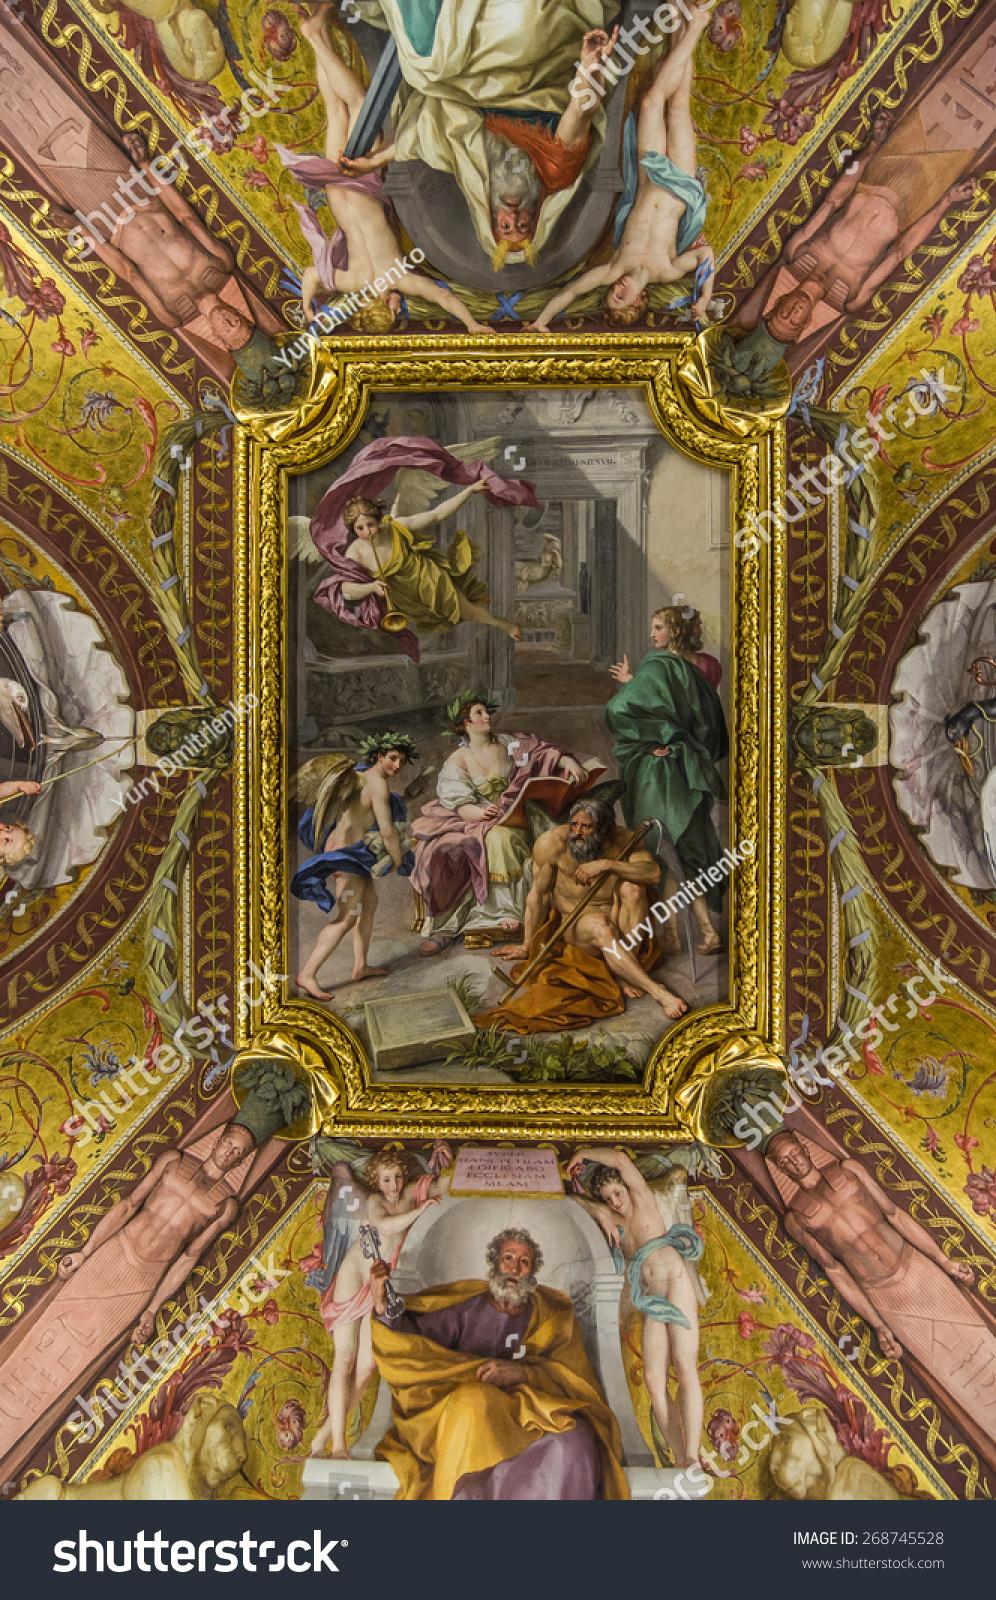 April 16, 2013: Ceiling Fresco The